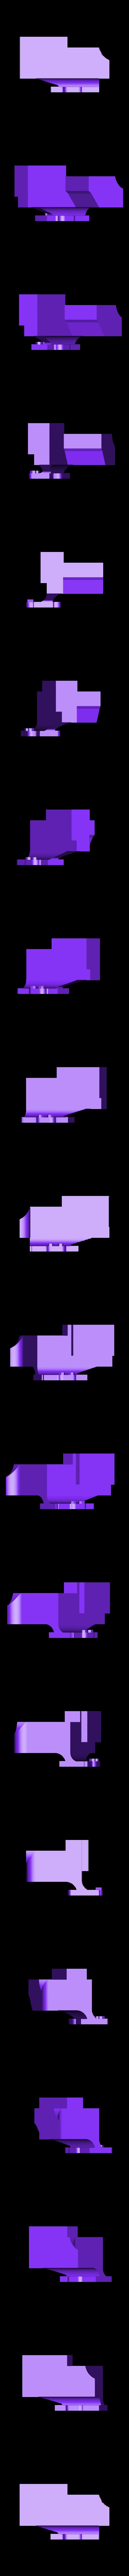 MakerBot_-_Rear_Engine-_SCALED-5.STL Download free STL file 4-8-8-4 Big Boy Locomotive • 3D printer object, RaymondDeLuca